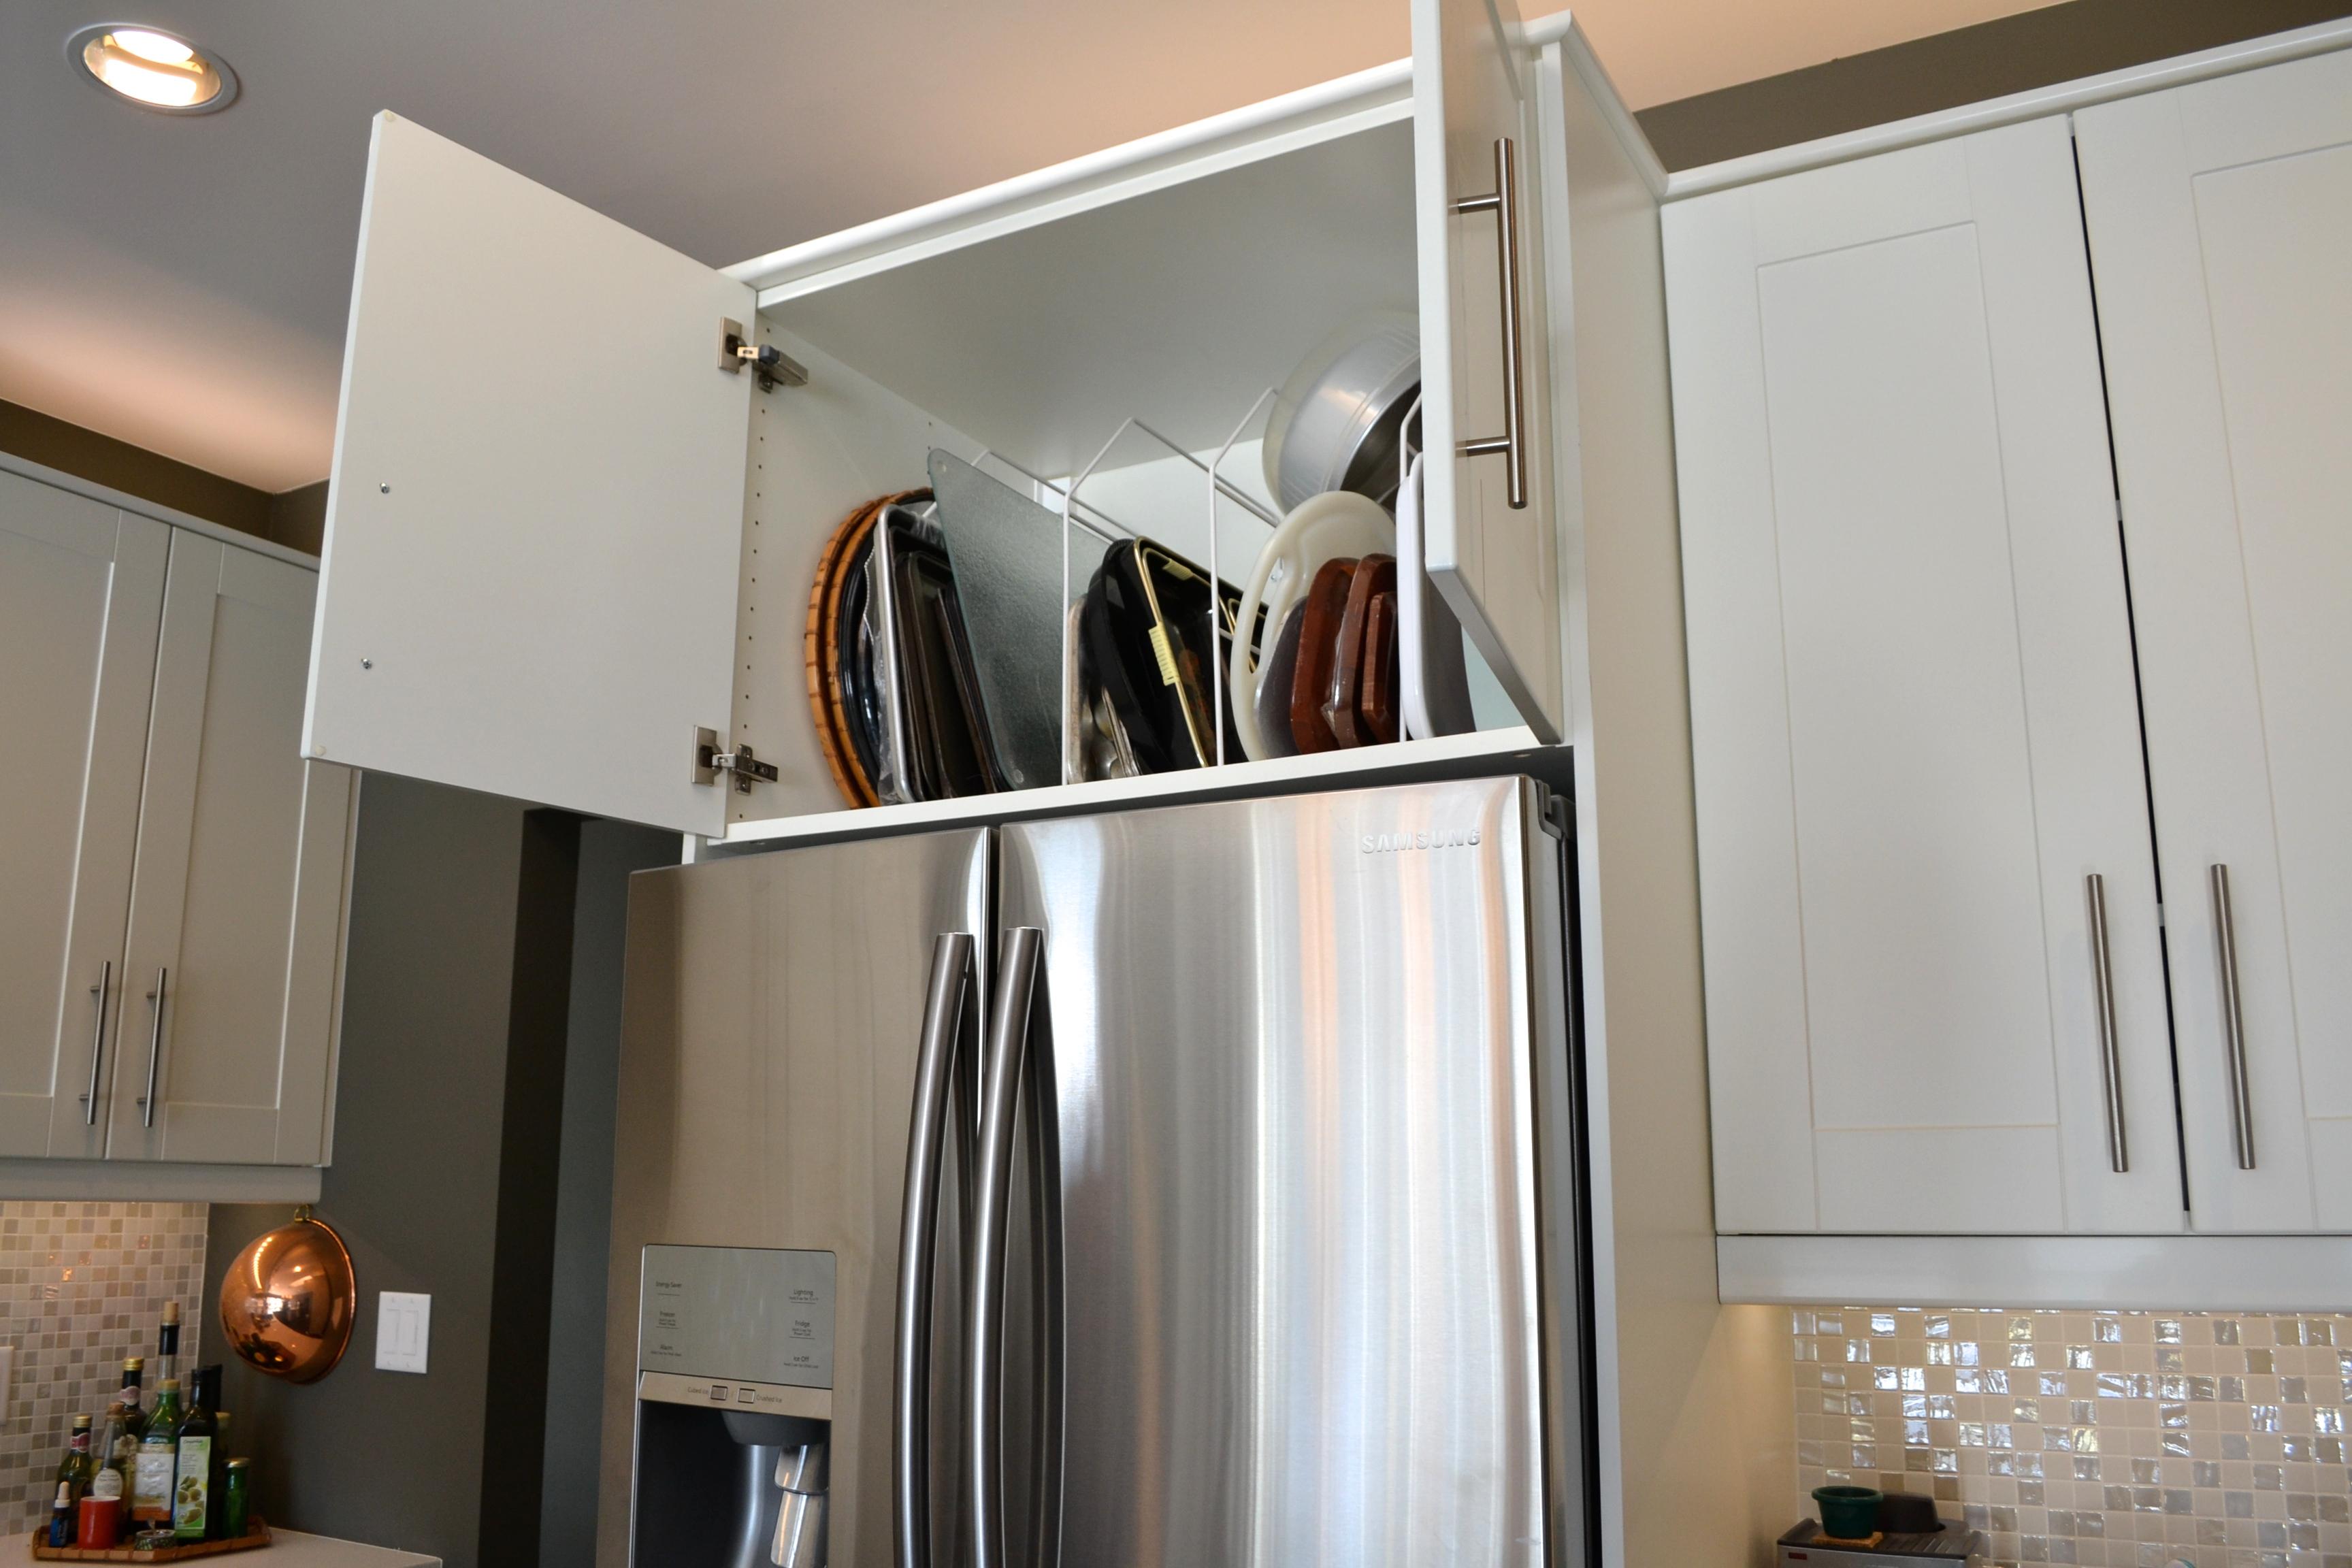 kitchen organization made easy - ikan installations